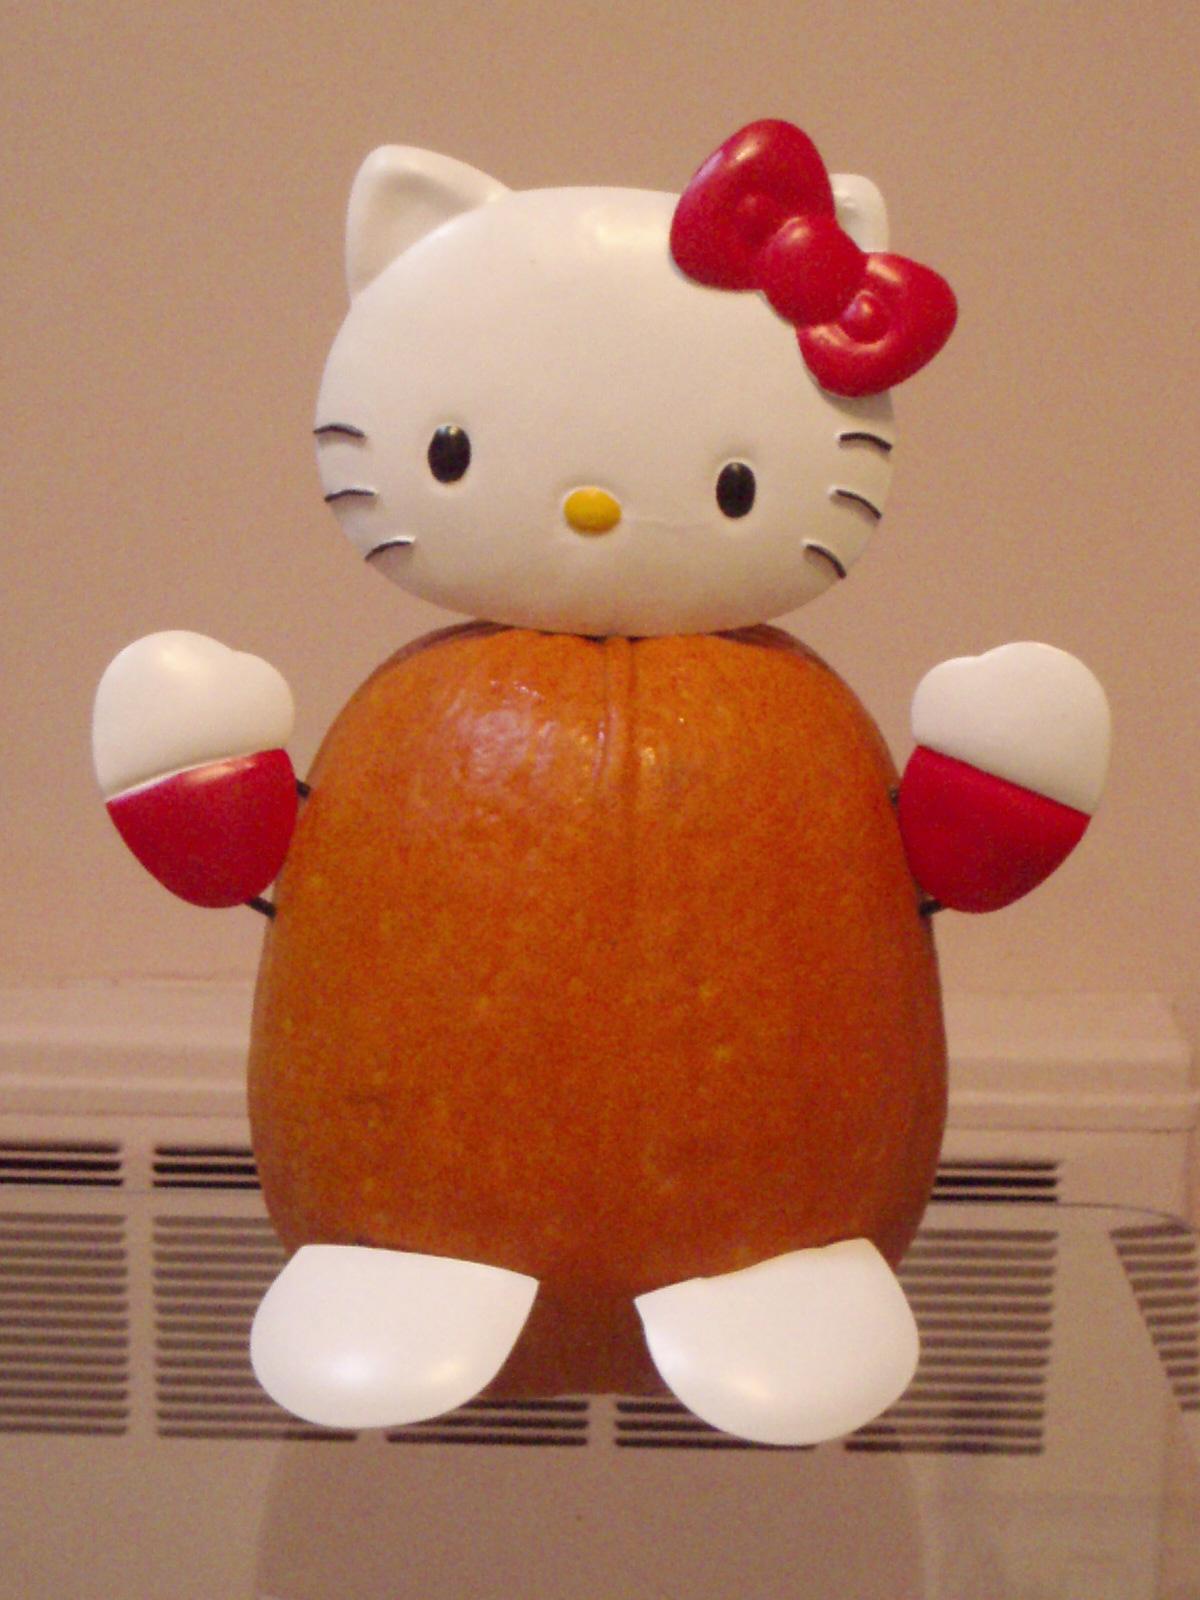 pumpkin carving – Hello Kitty Hell